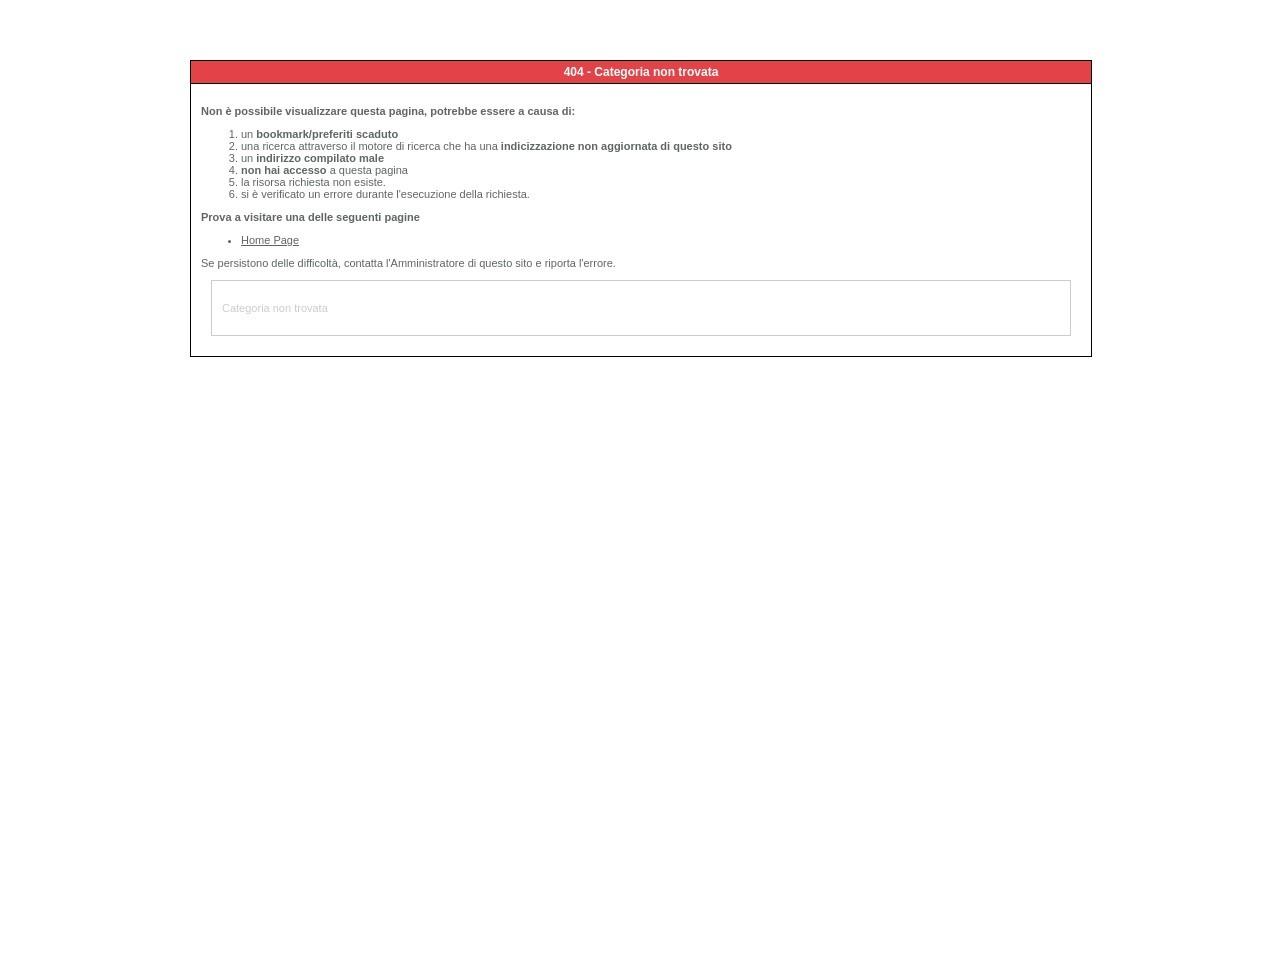 auxiliagest-srl-soluzioni-energetiche-bioedilizia-impianti-fotovoltaici-solare-termico